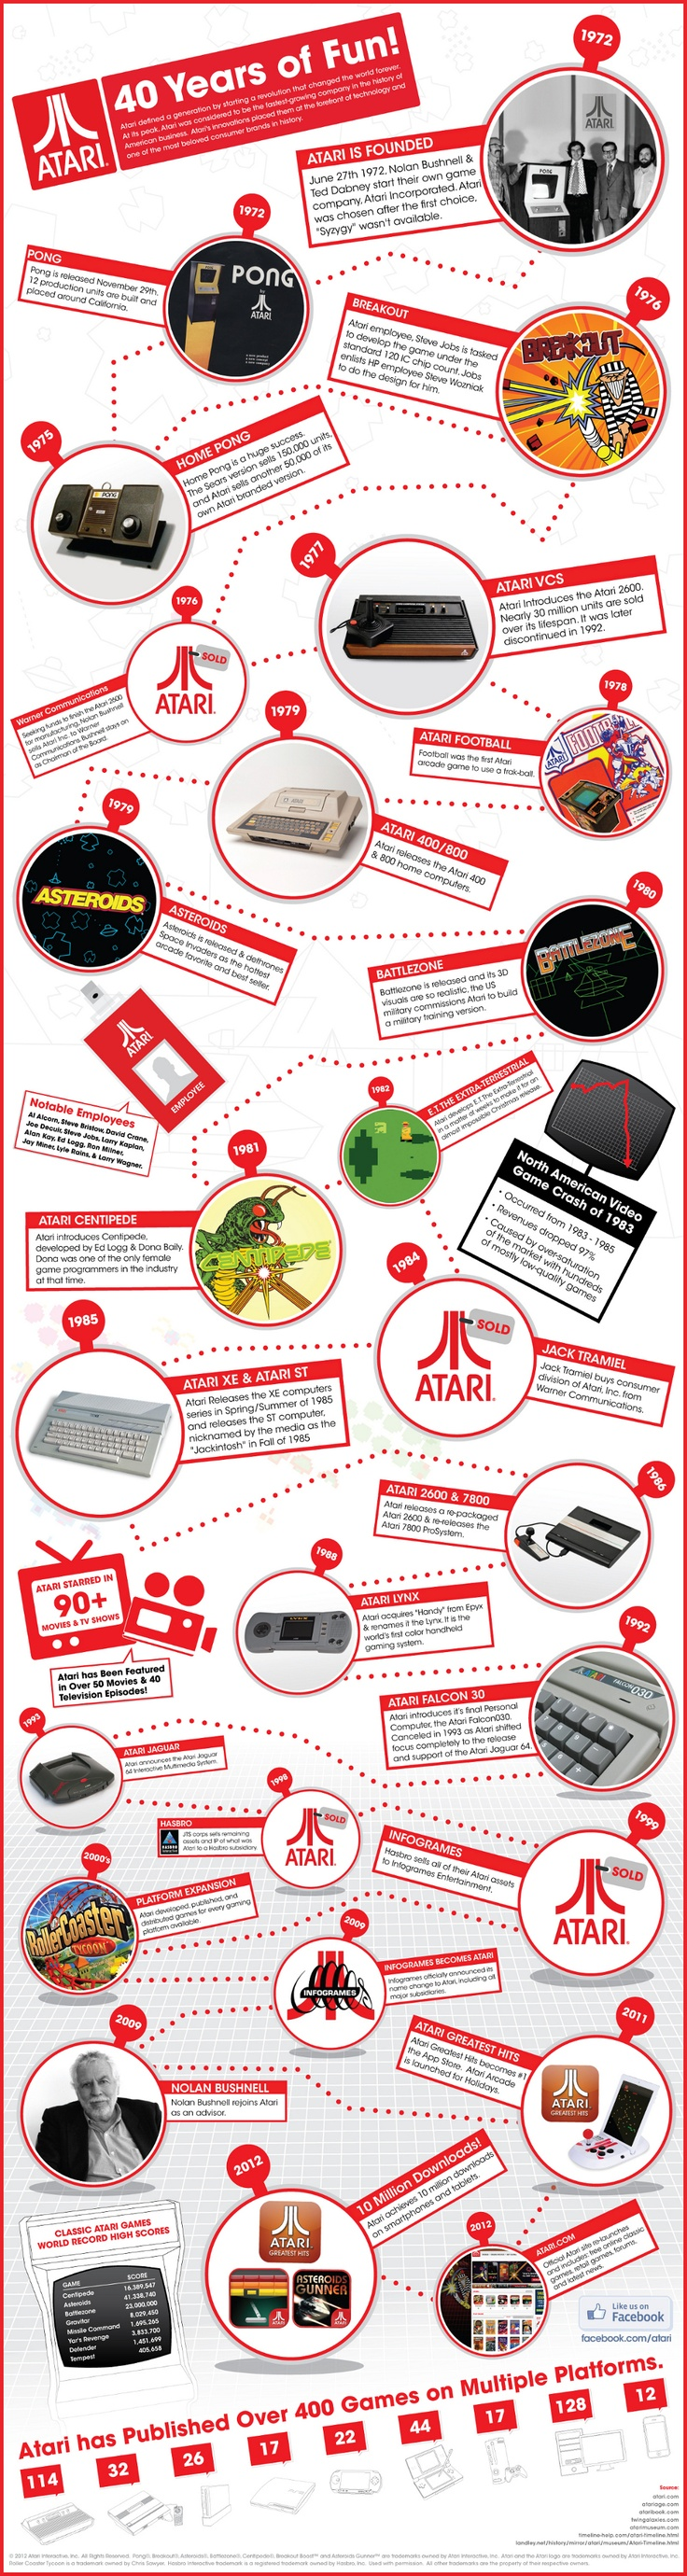 The 40 year life of Atari: Profile of an icon